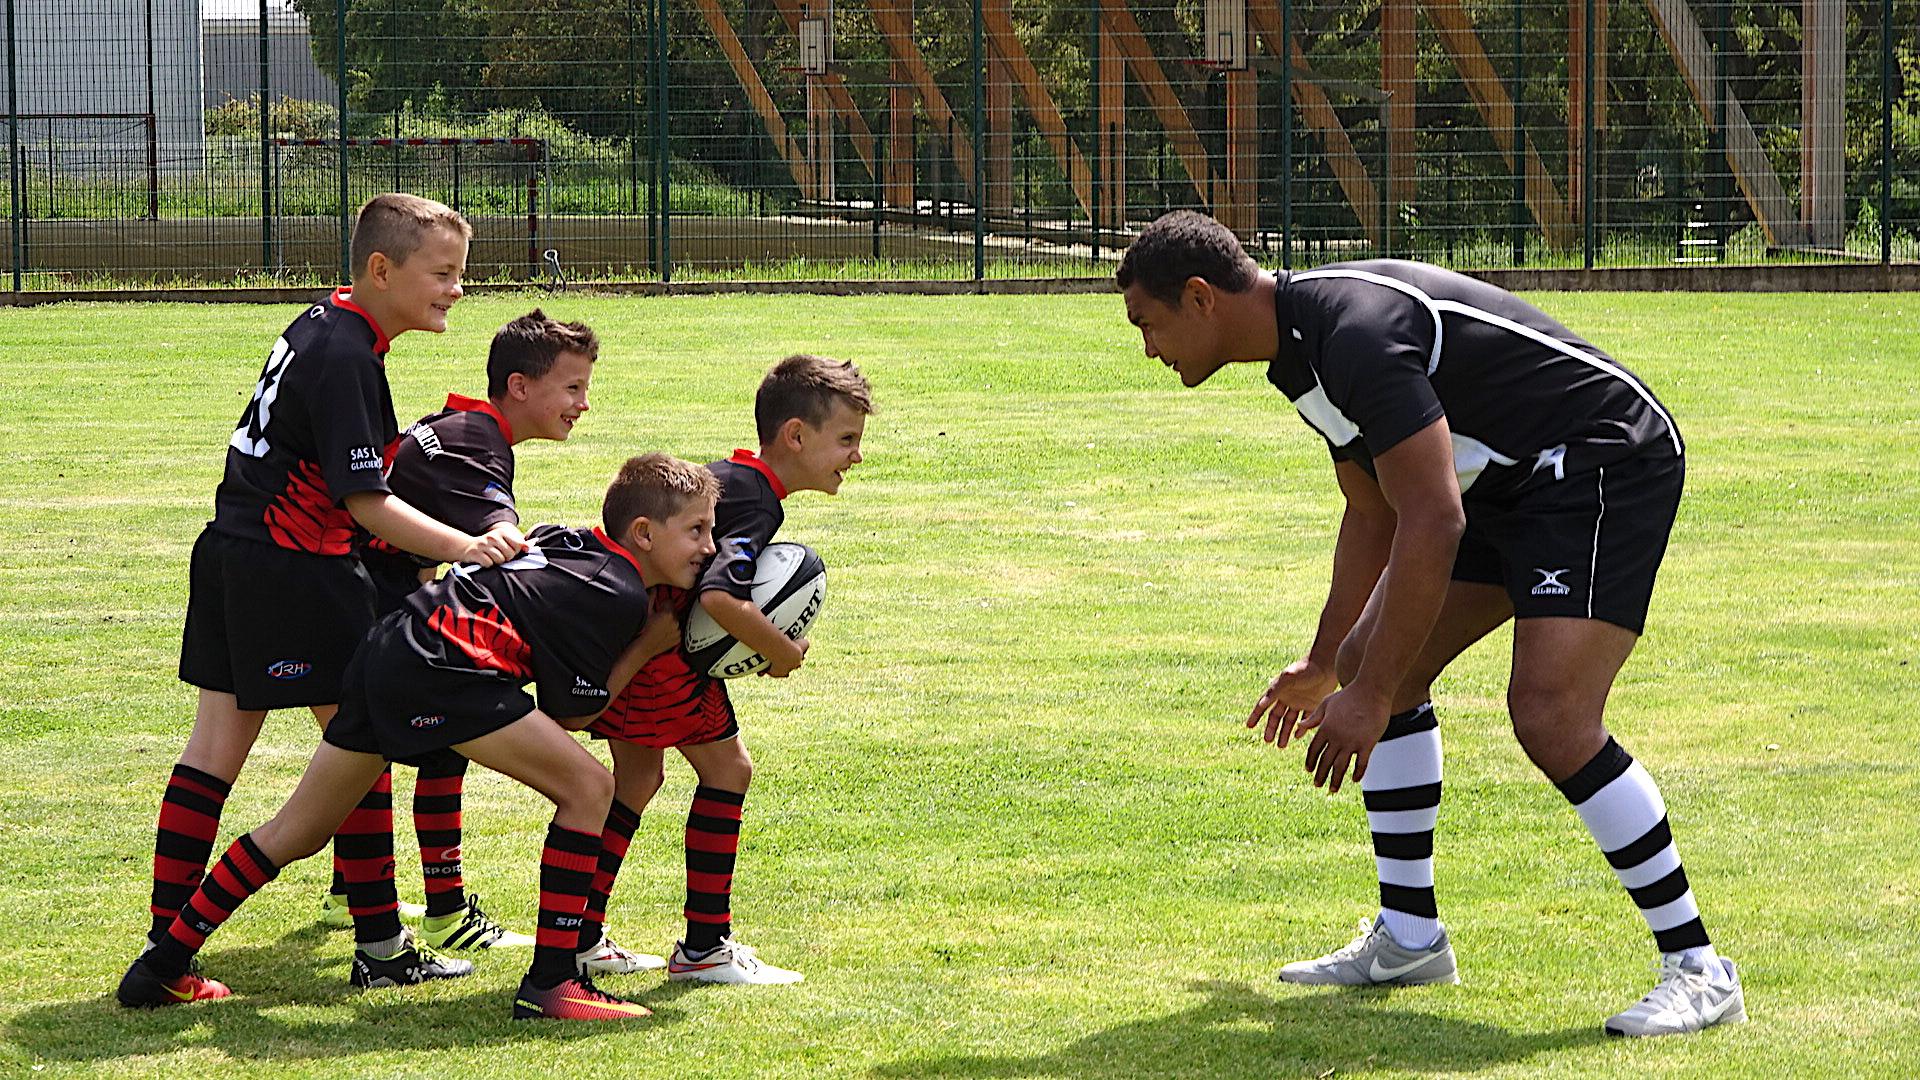 Thierry Dusautoir ambassadeur du Rugby corse